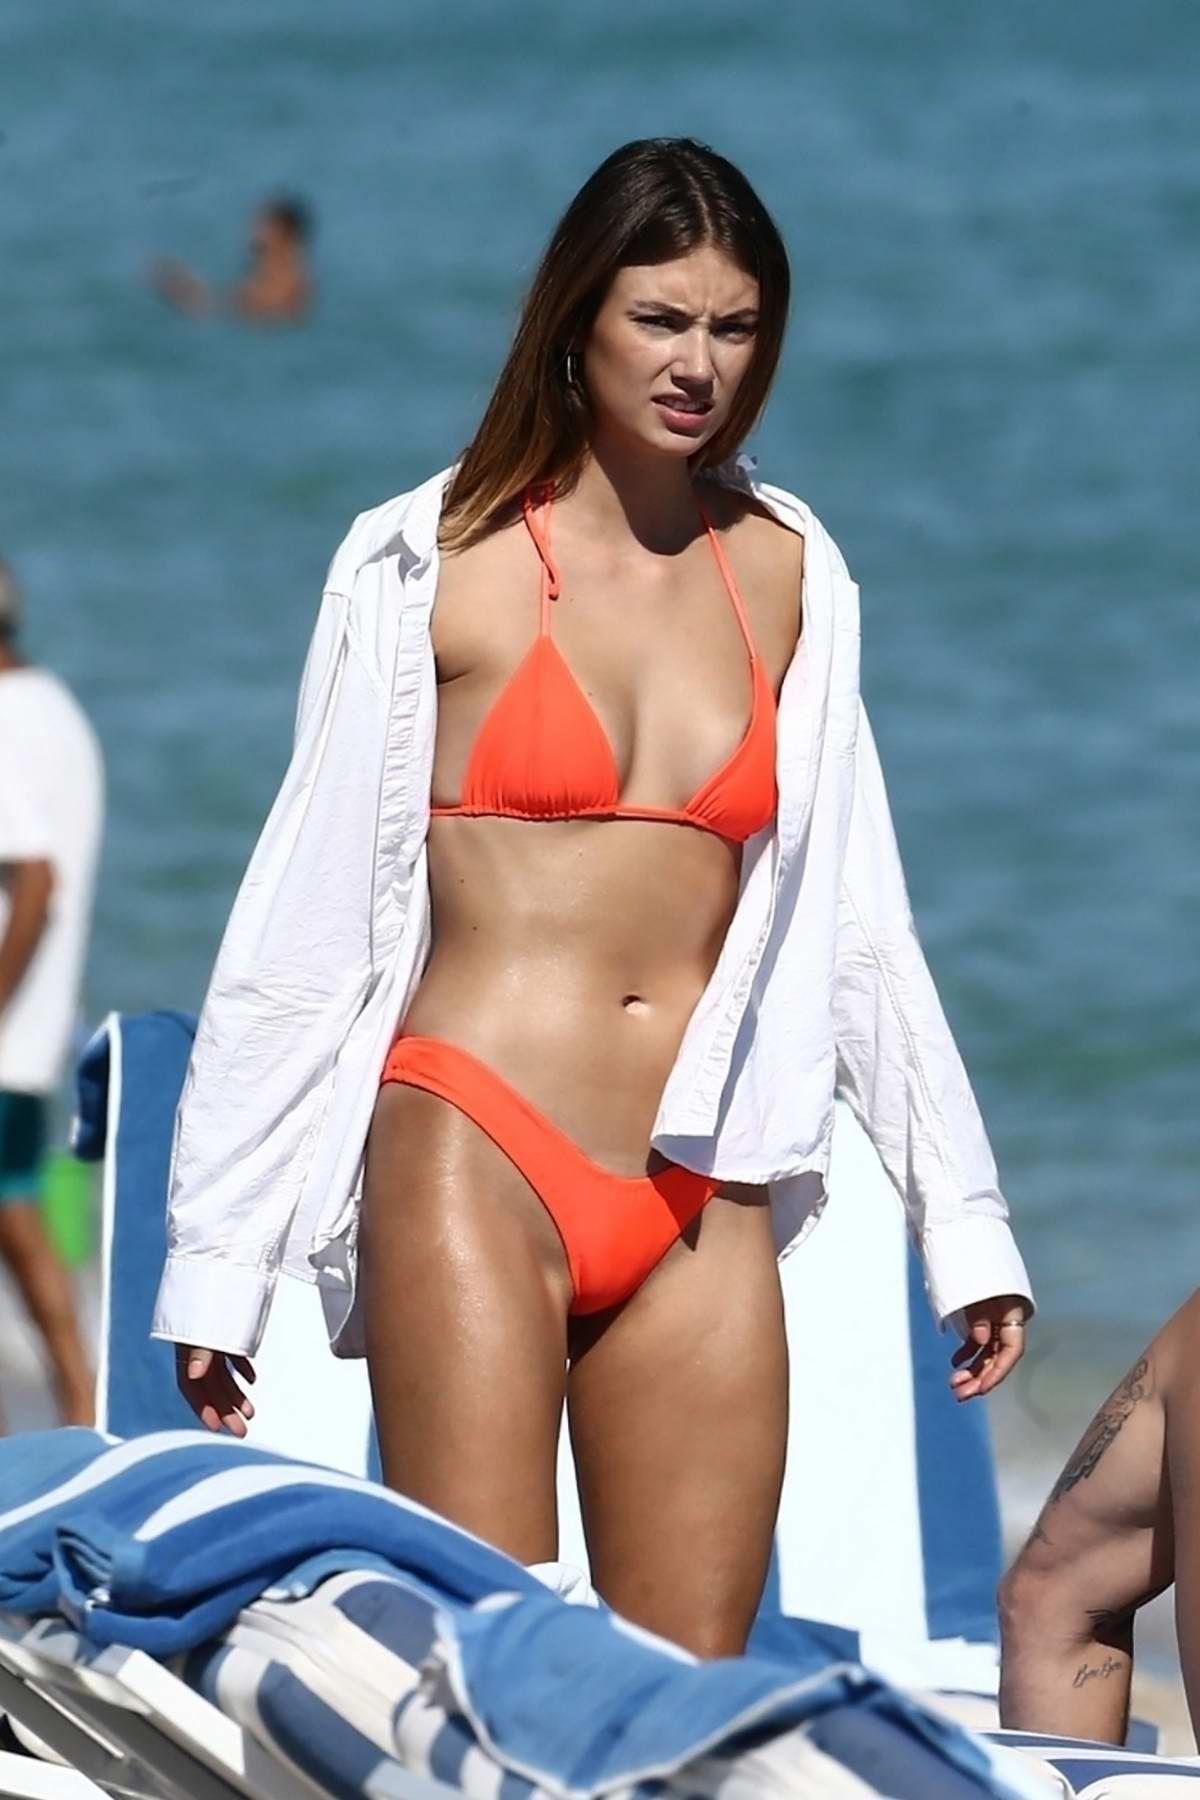 Lorena Rae sports a bright orange bikini as she hits the beach with friends in Miami Beach, Florida